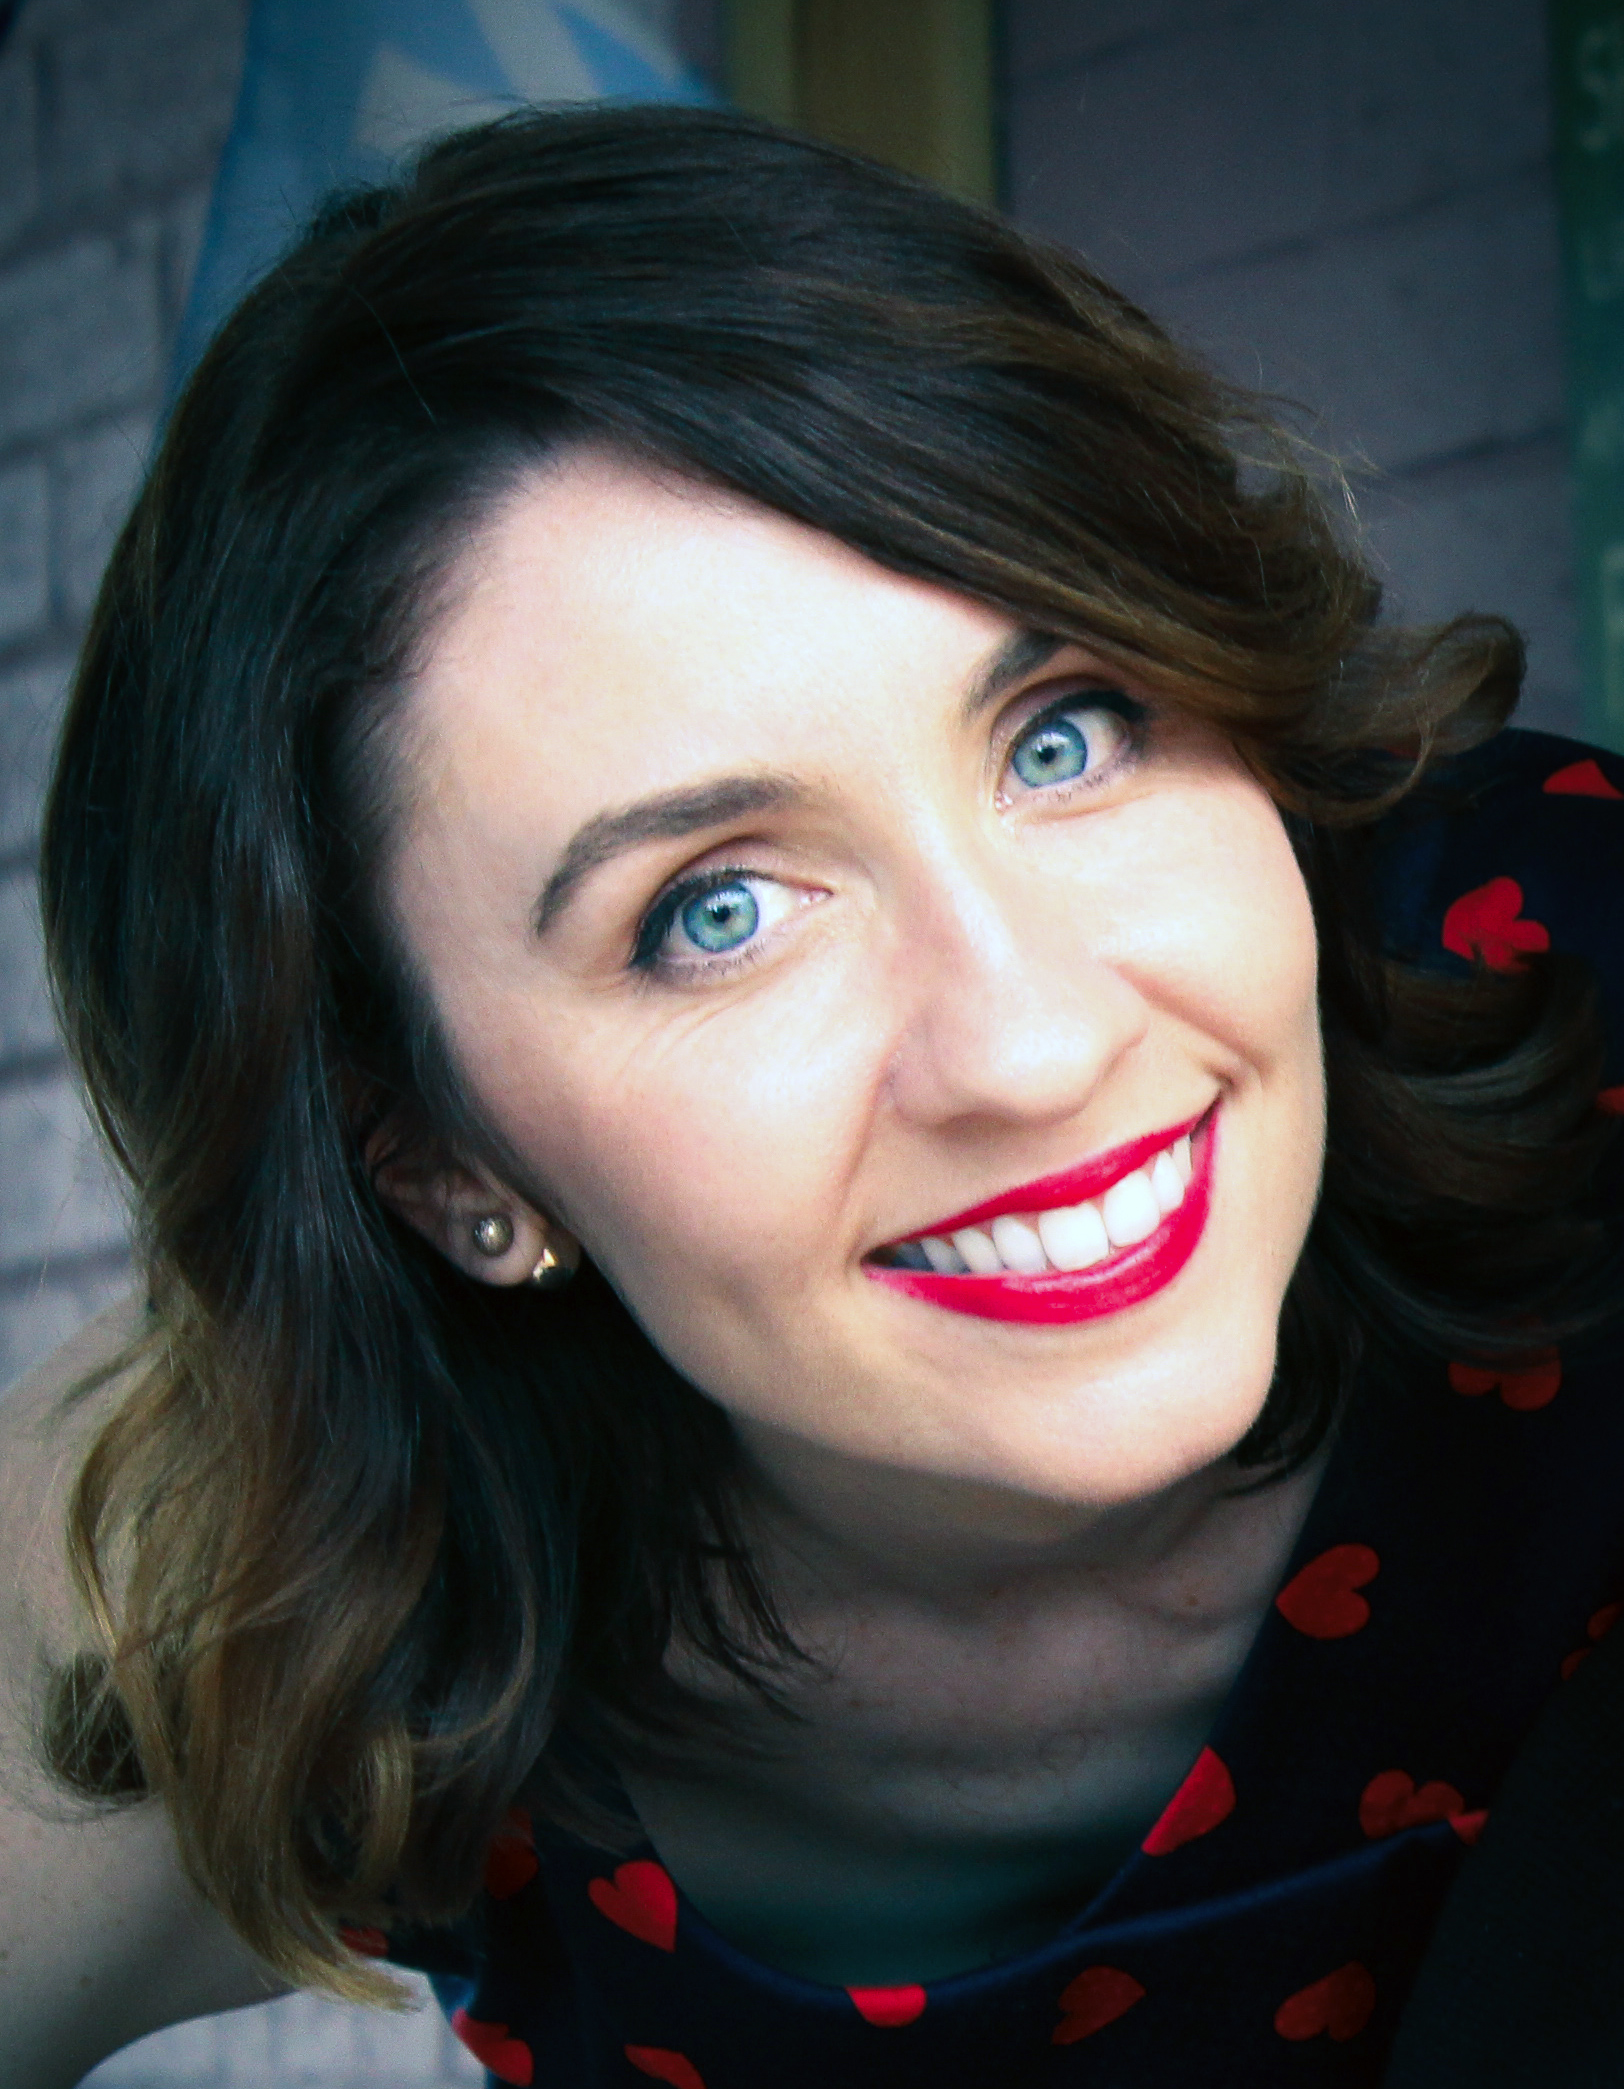 Irish dance teacher Louise Lenihan TCRG, from Penrith NSW